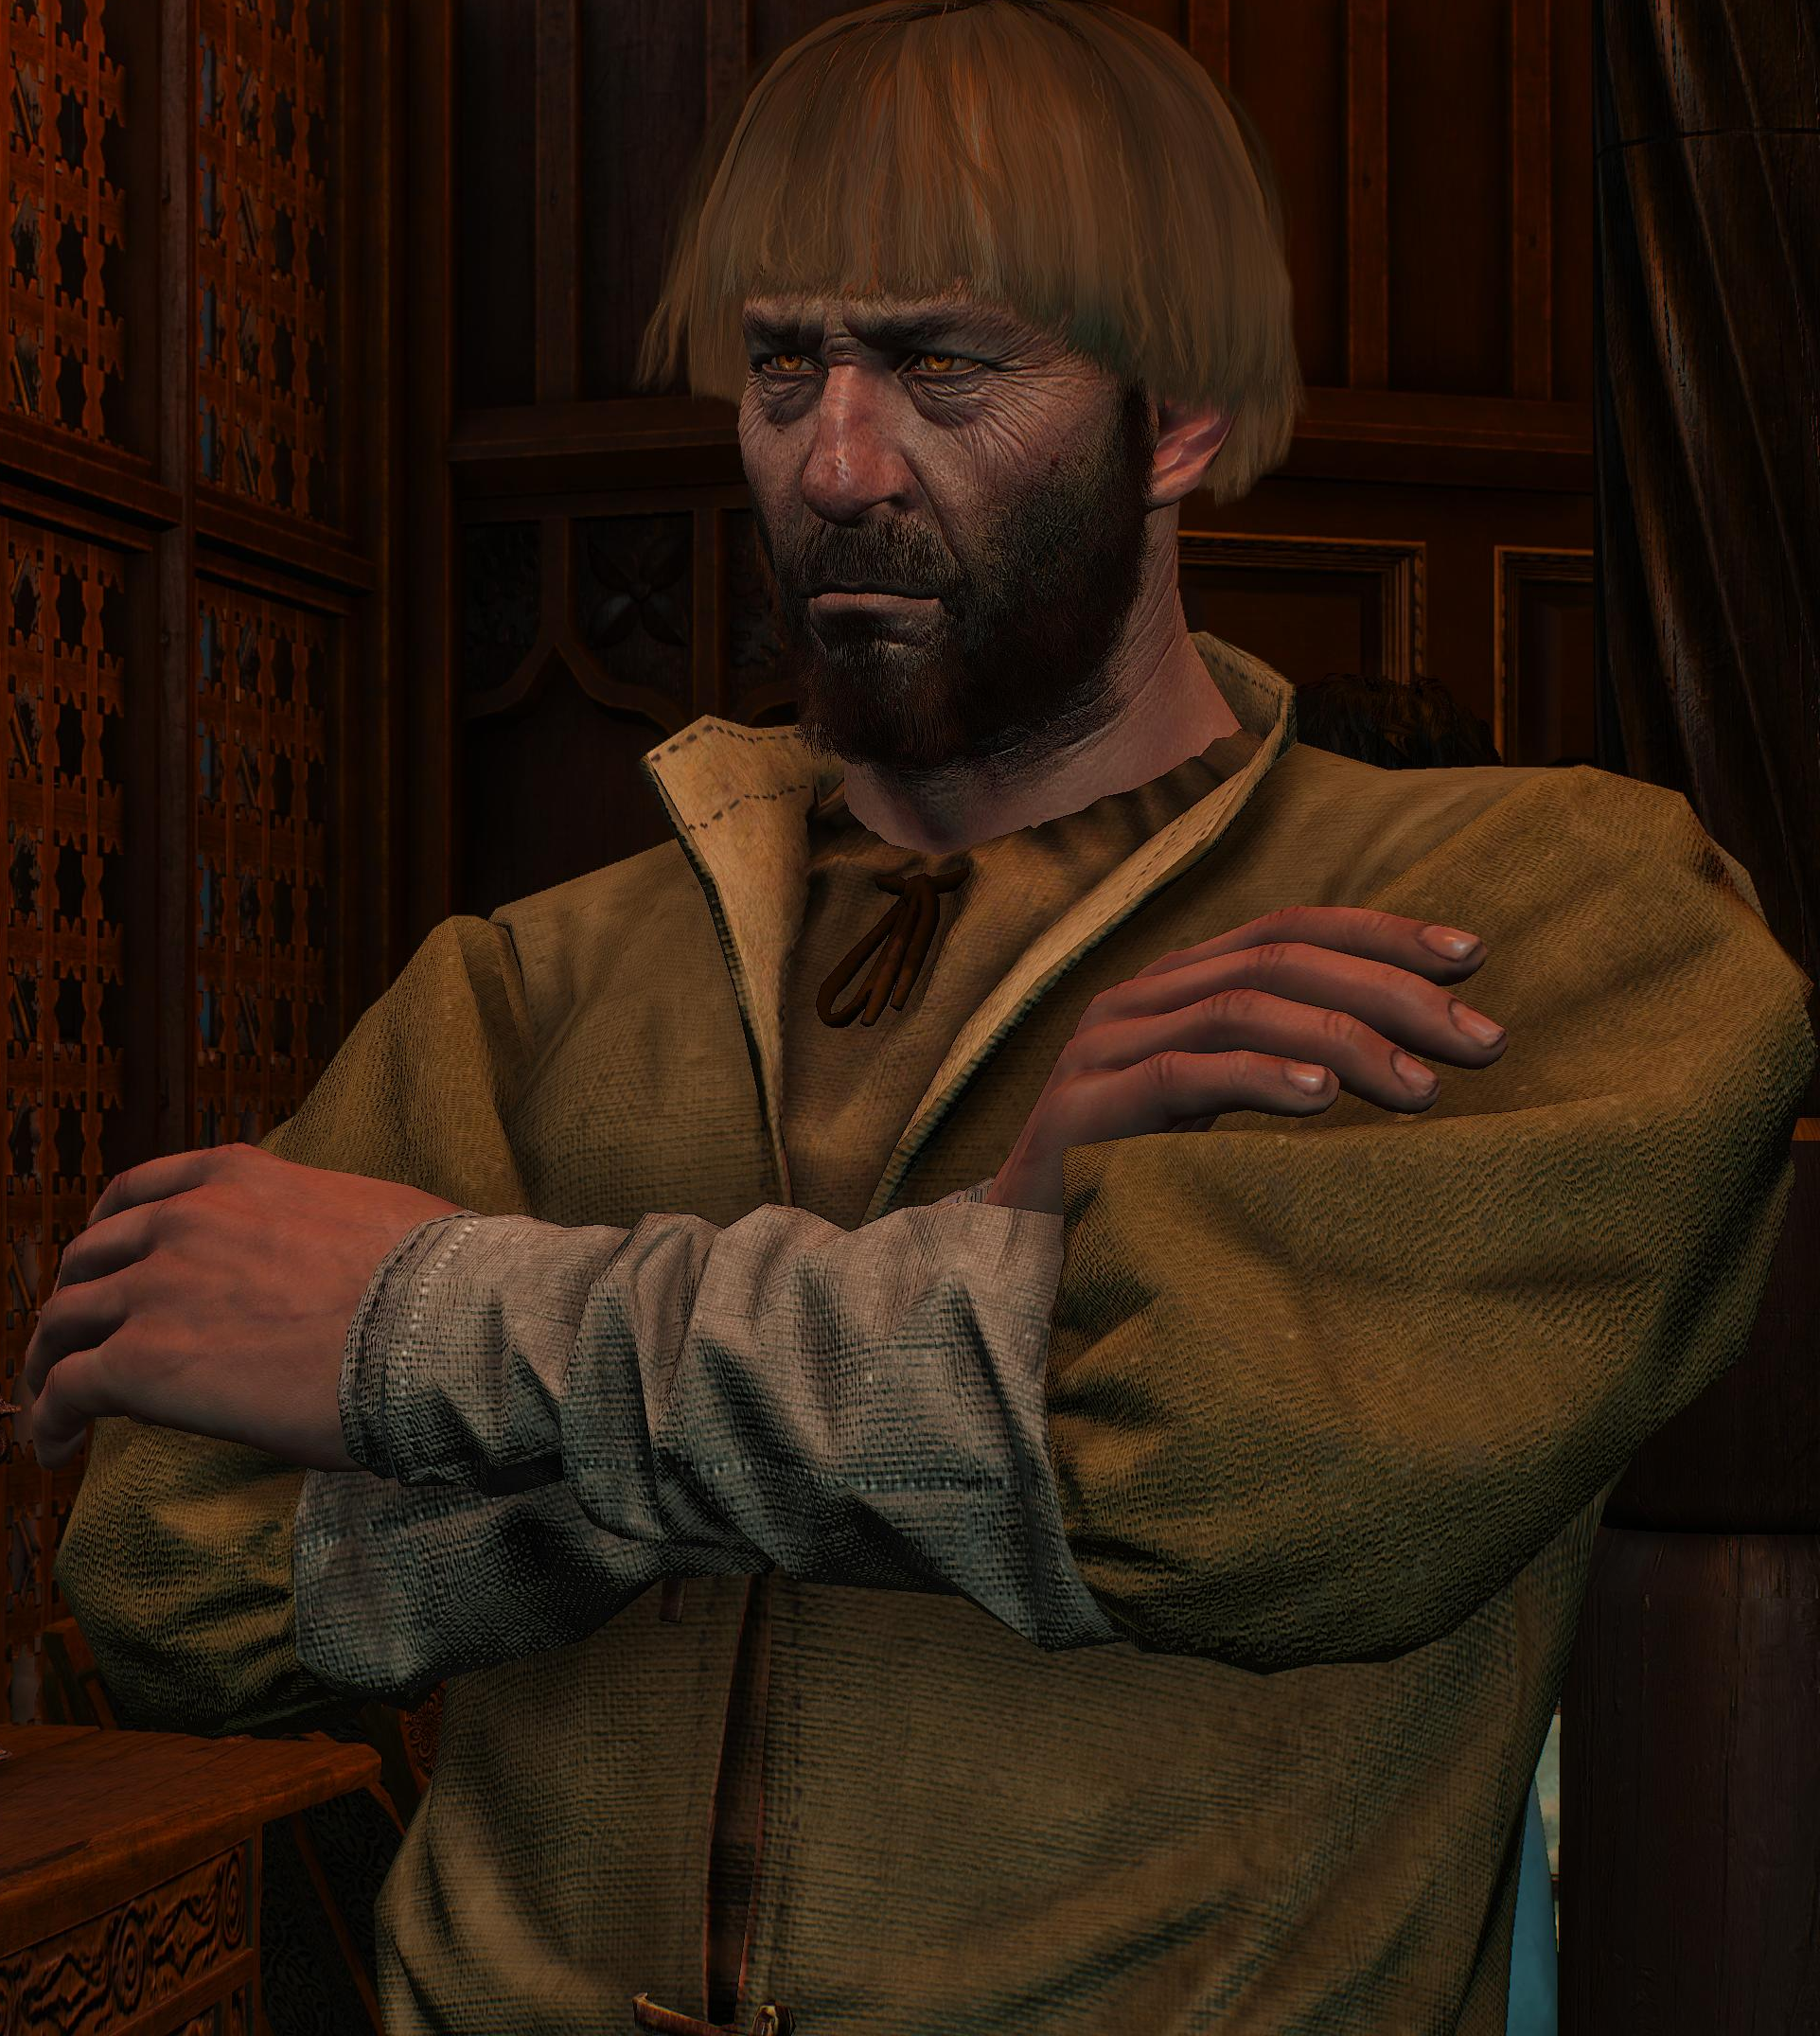 Harald Featherbuns